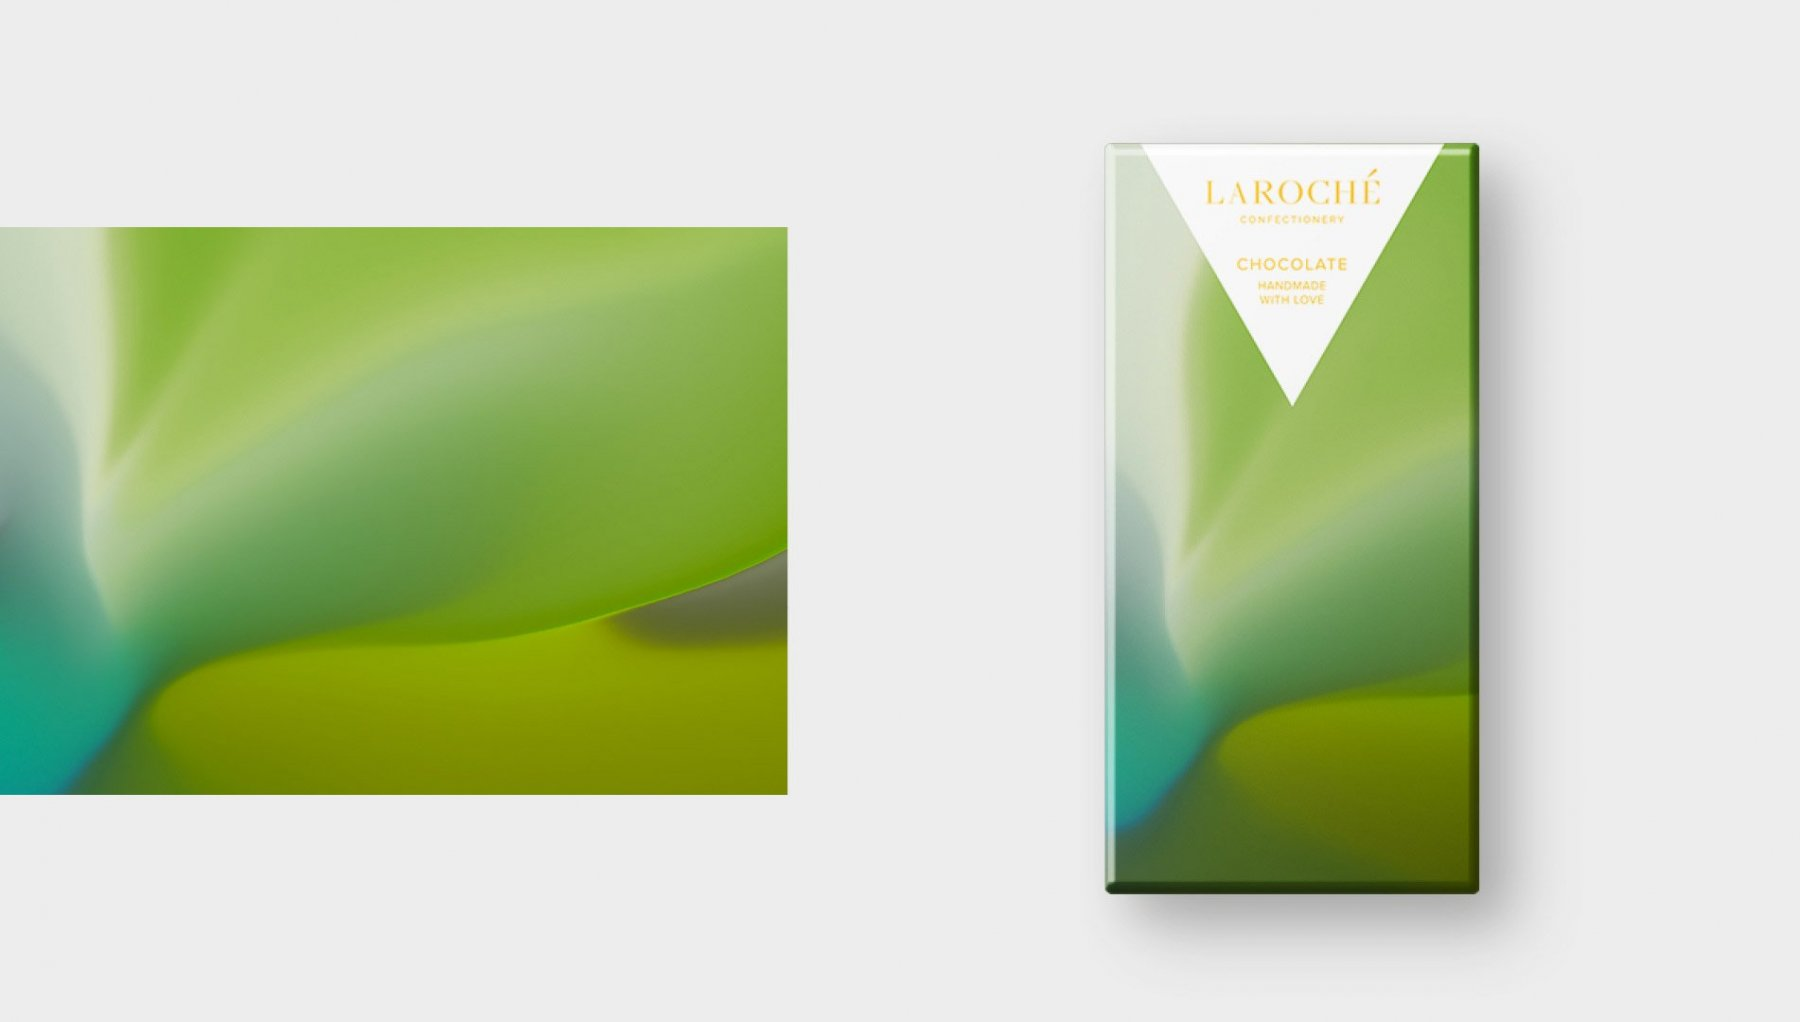 Laroche-Chocolate-Packaging-by-Martin-Naumann-06